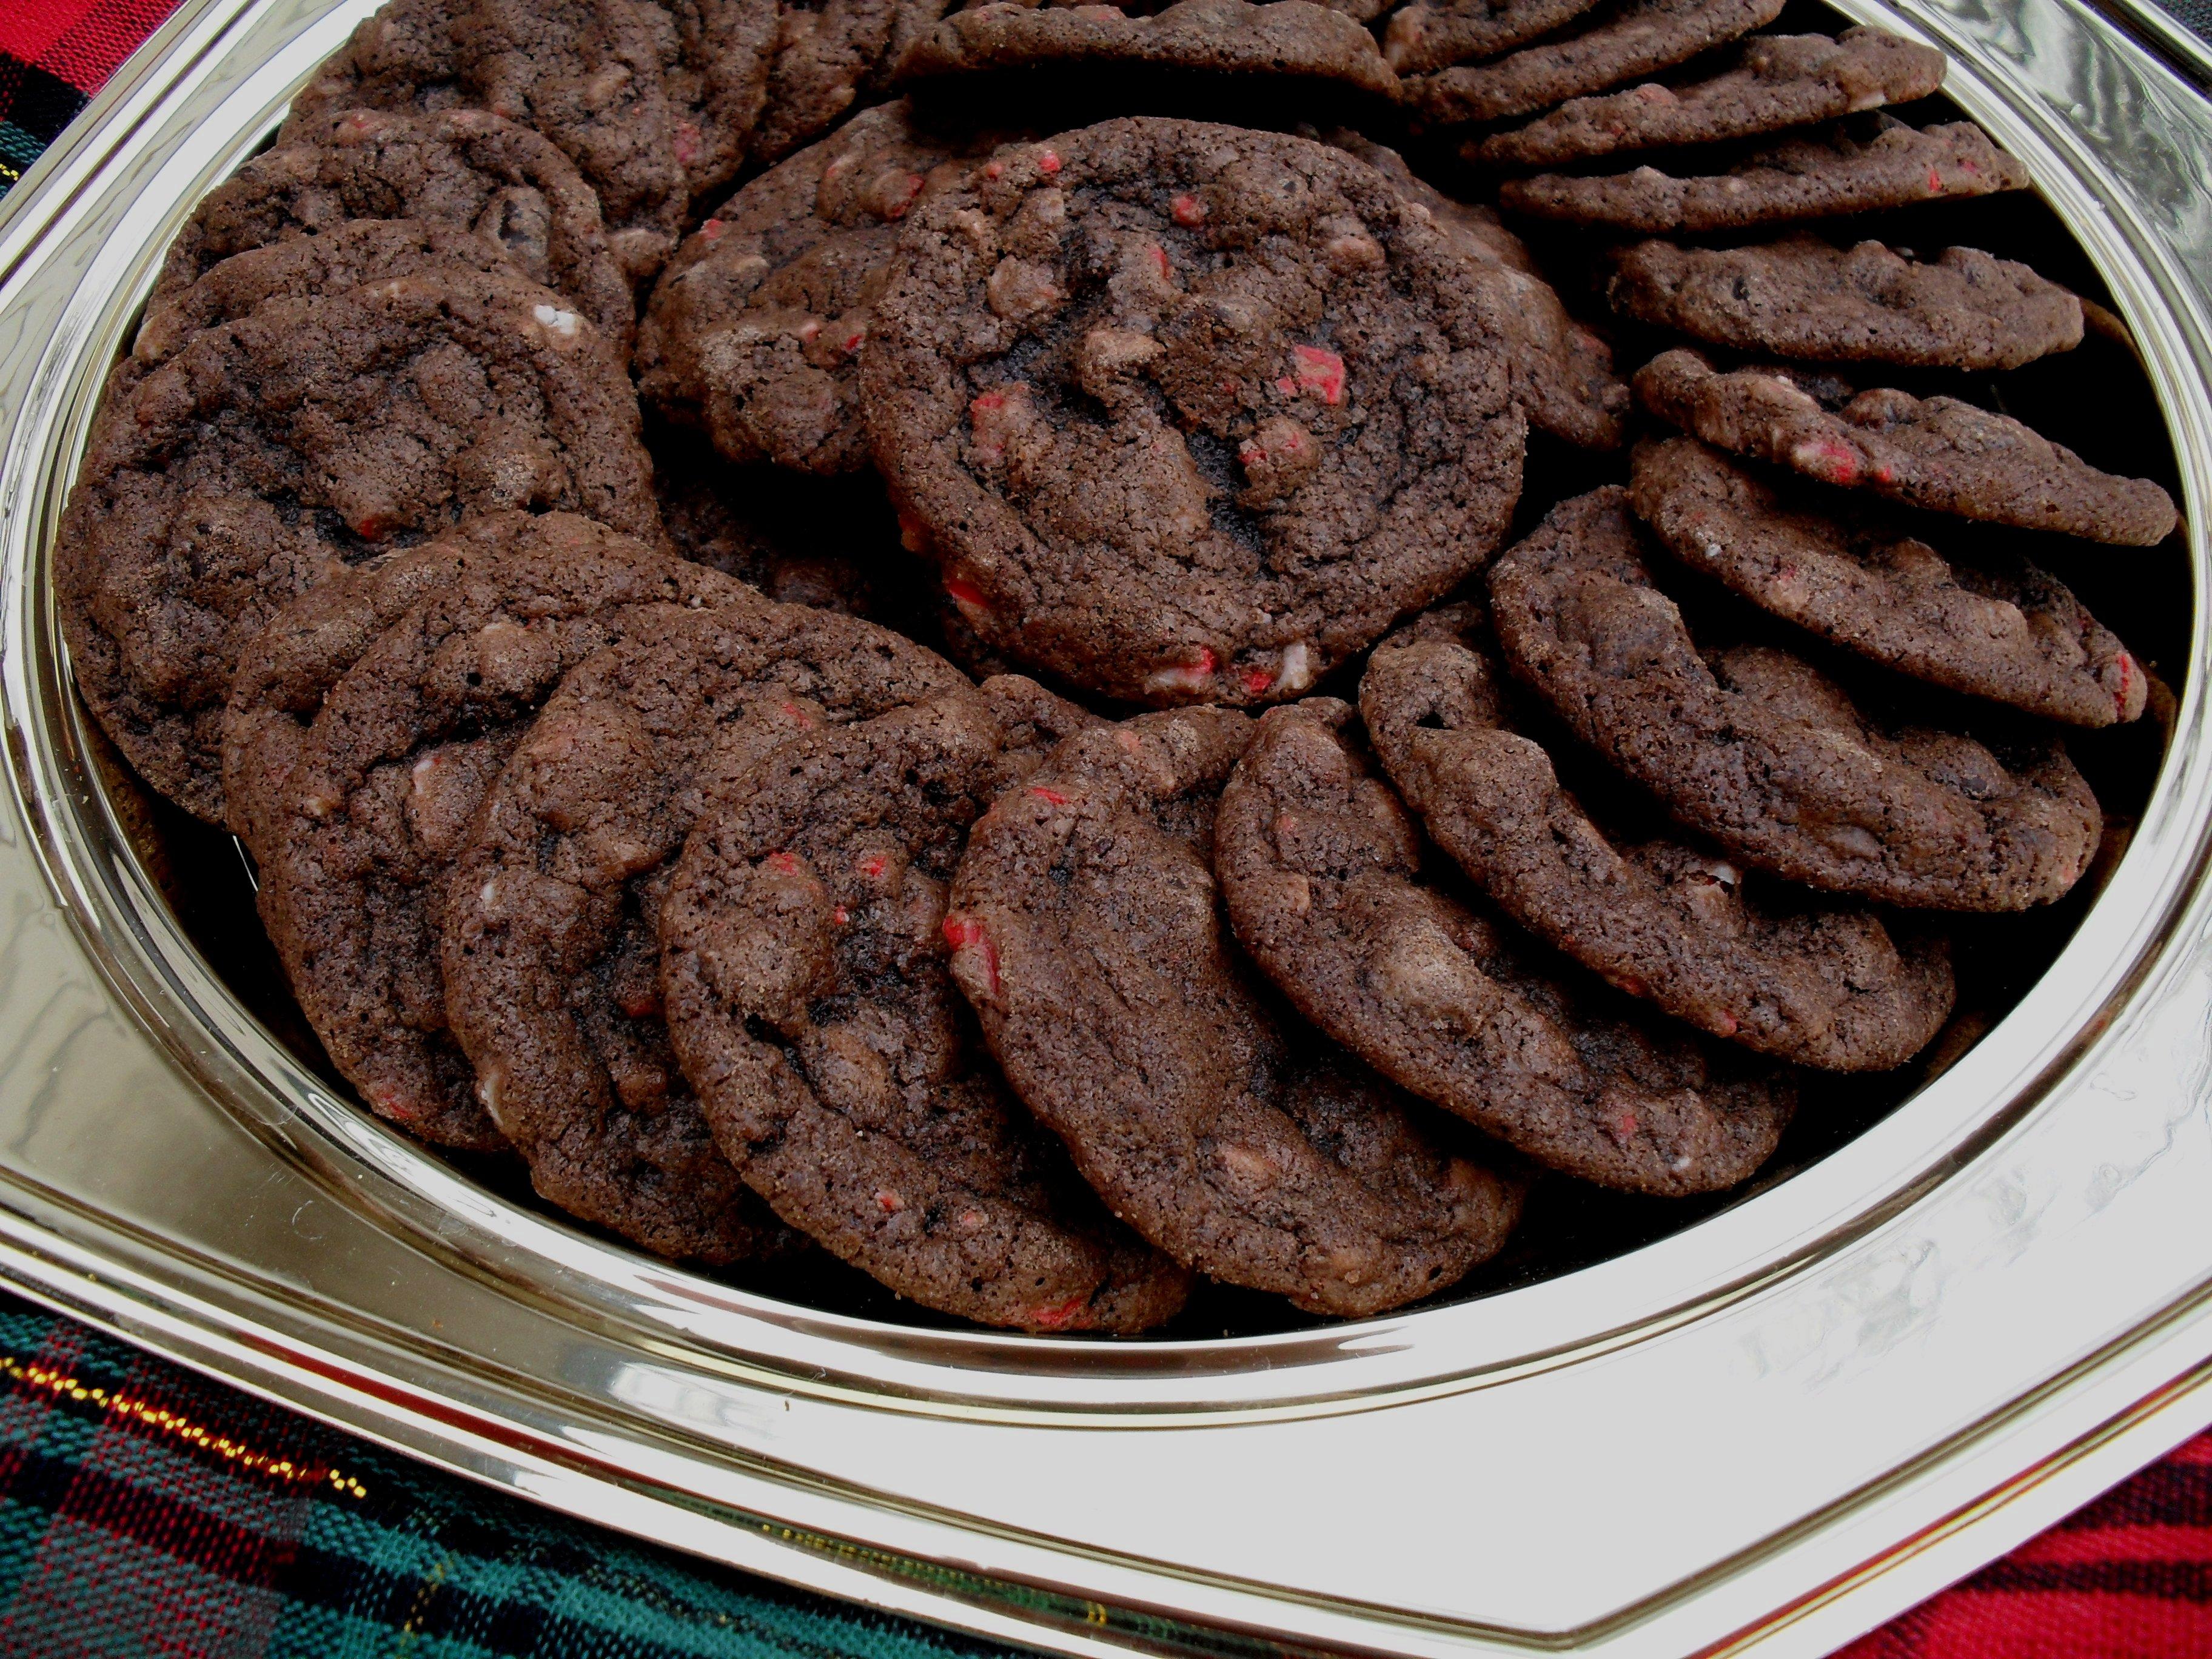 Chocolate Peppermint Chip Cookies | Veronica's Cornucopia